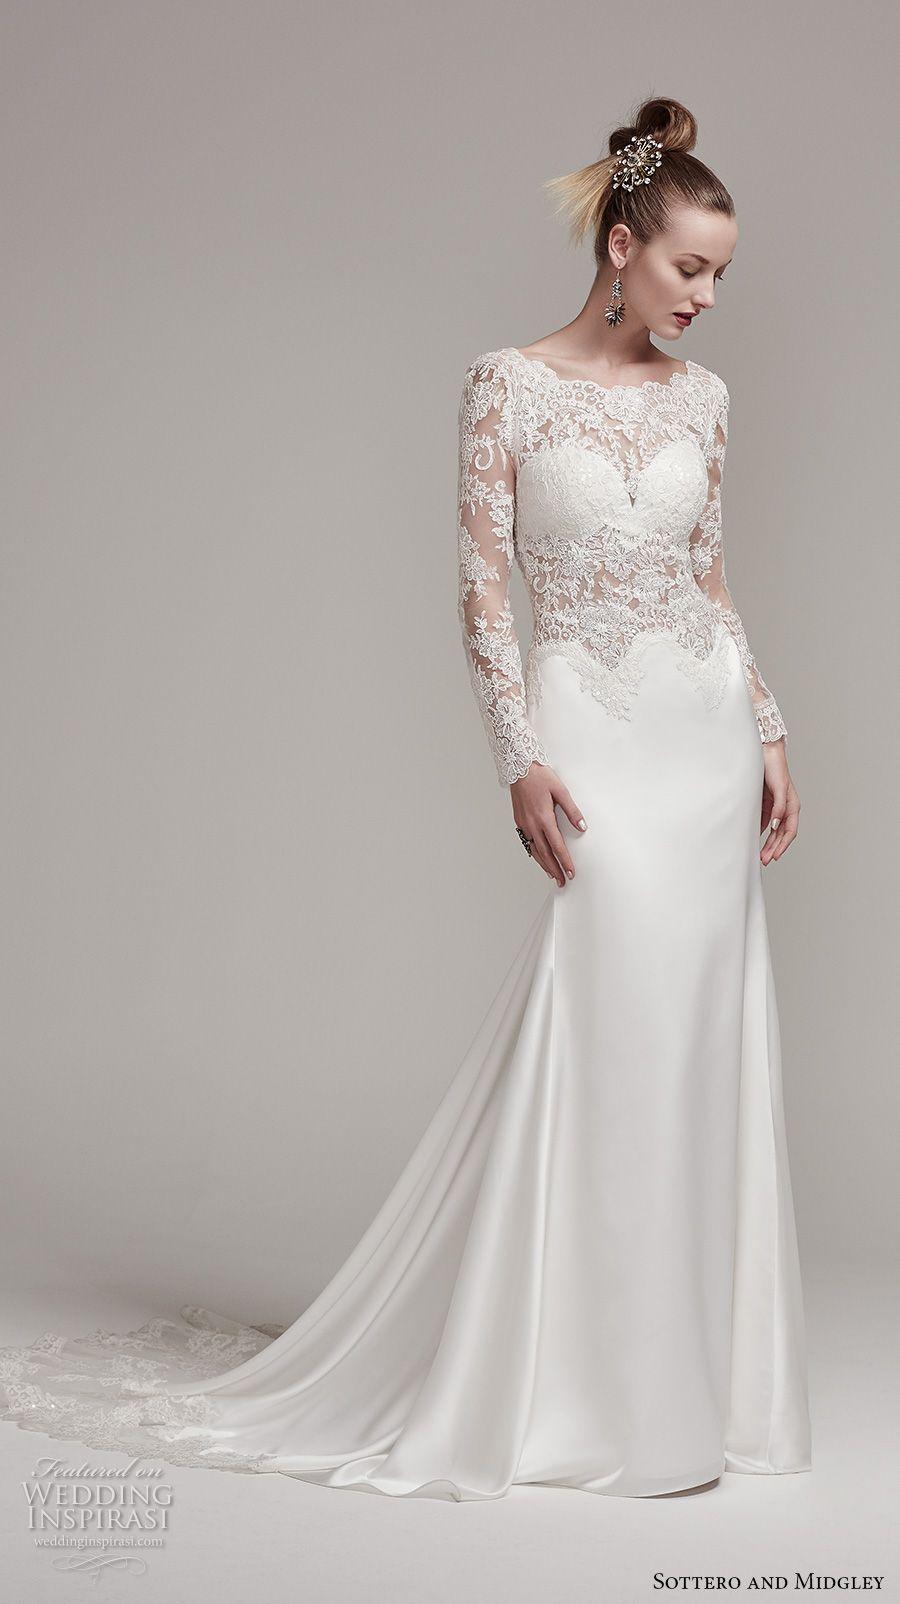 Satin Long Sleeve Sheath Wedding Dresses